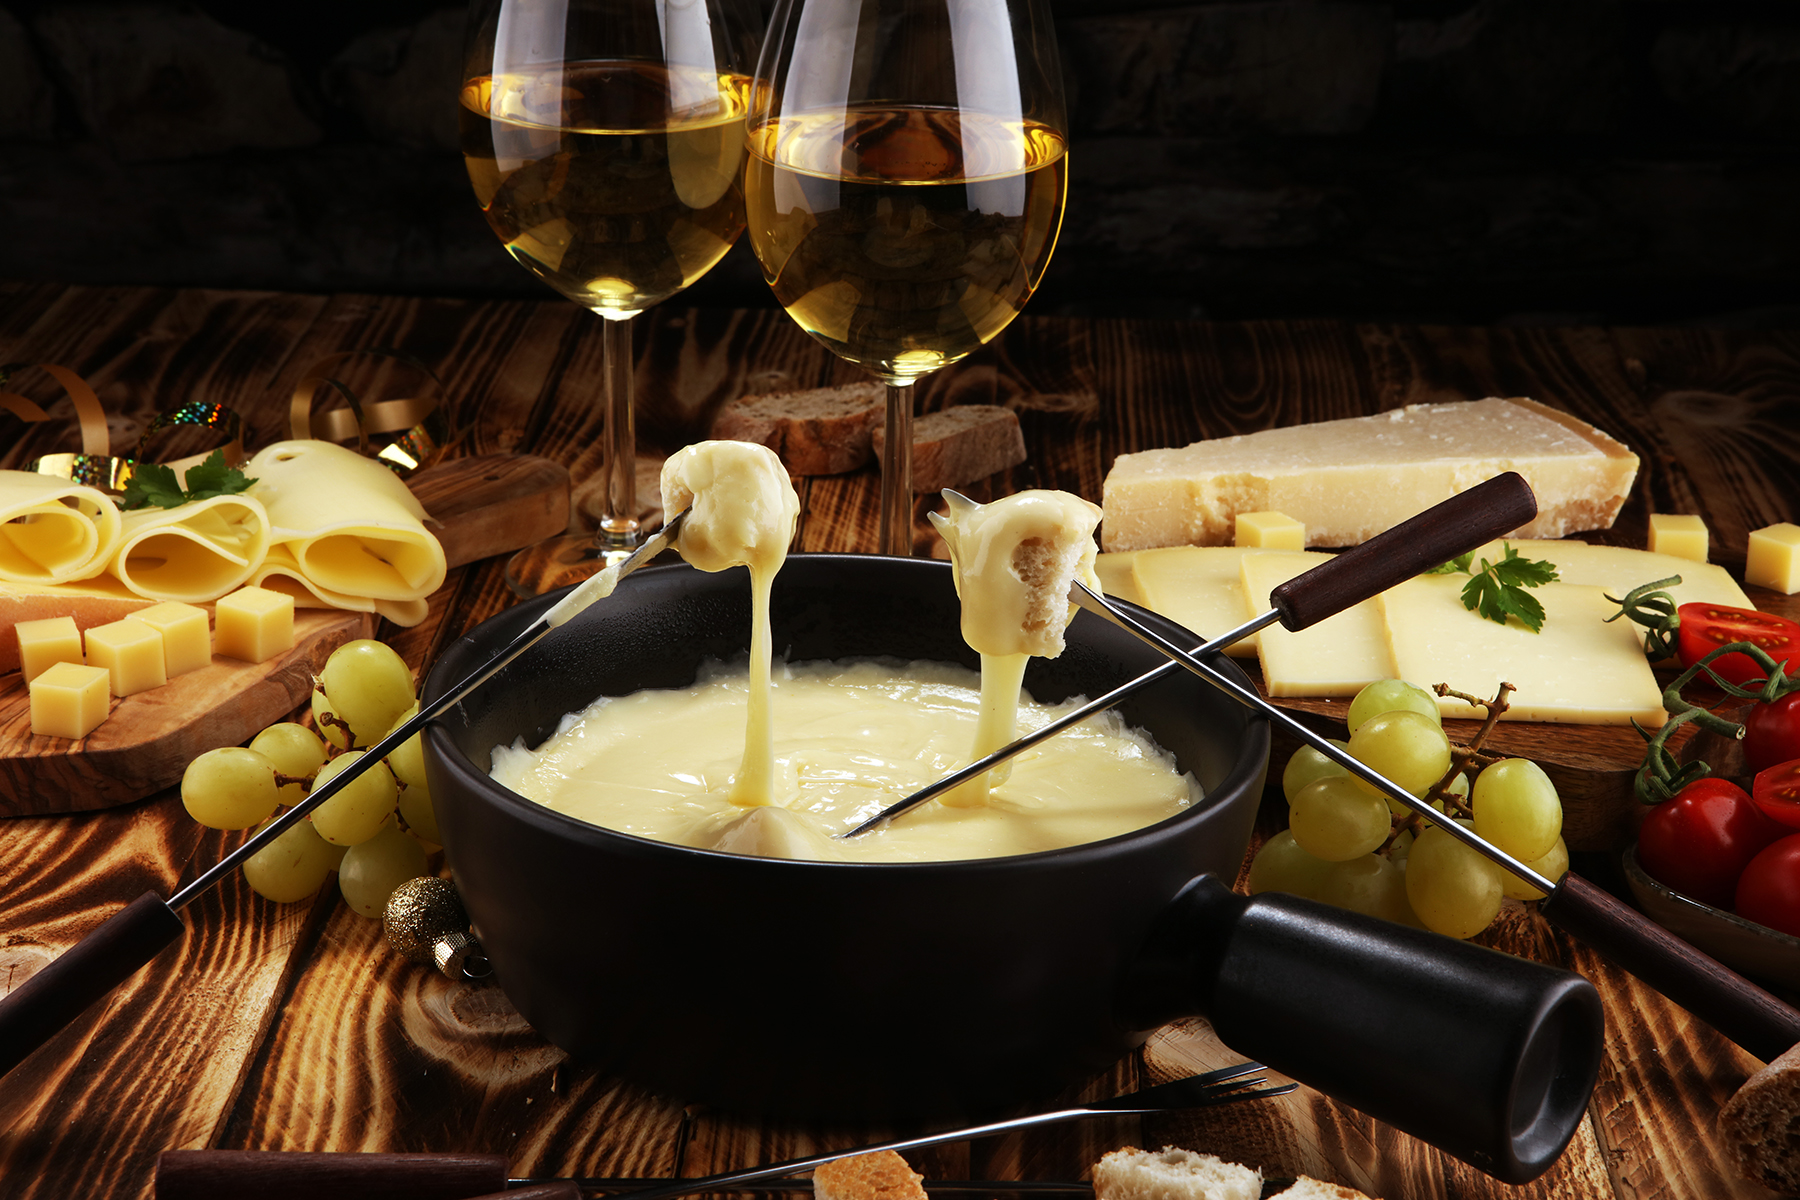 Dishes from Switzerland | Fondue